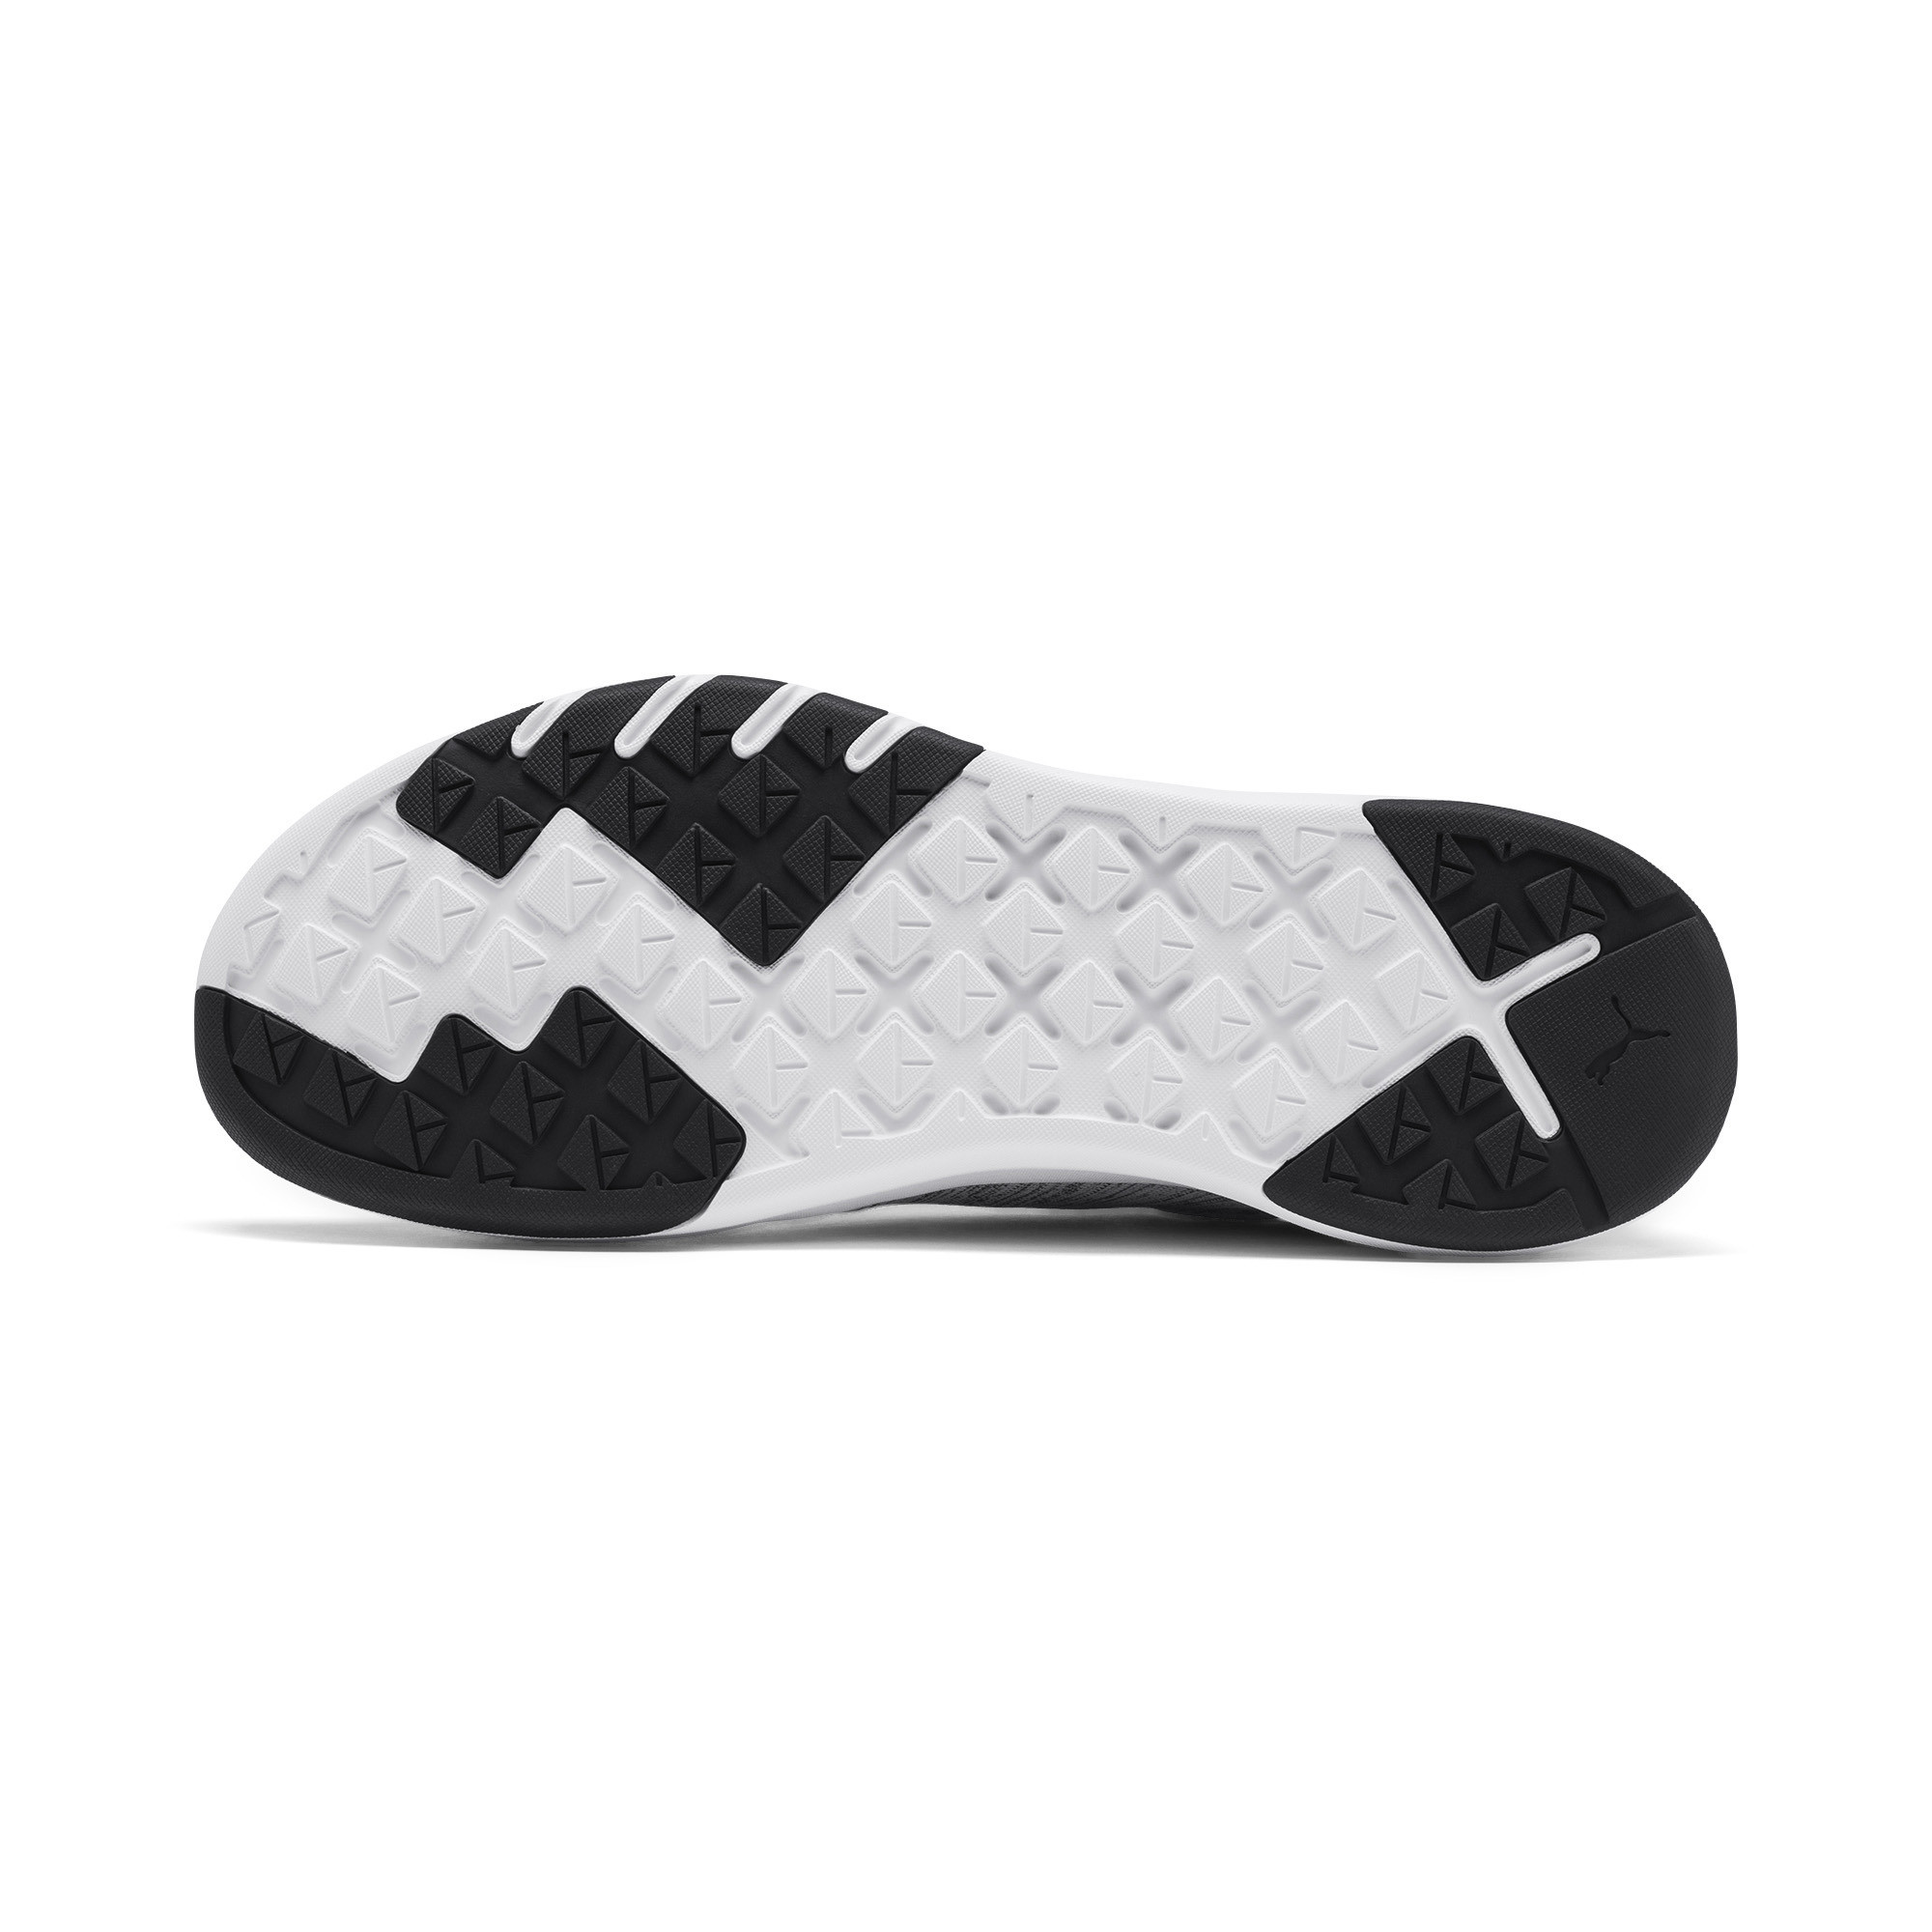 PUMA-Men-039-s-IGNITE-Contender-Knit-Running-Shoes thumbnail 23